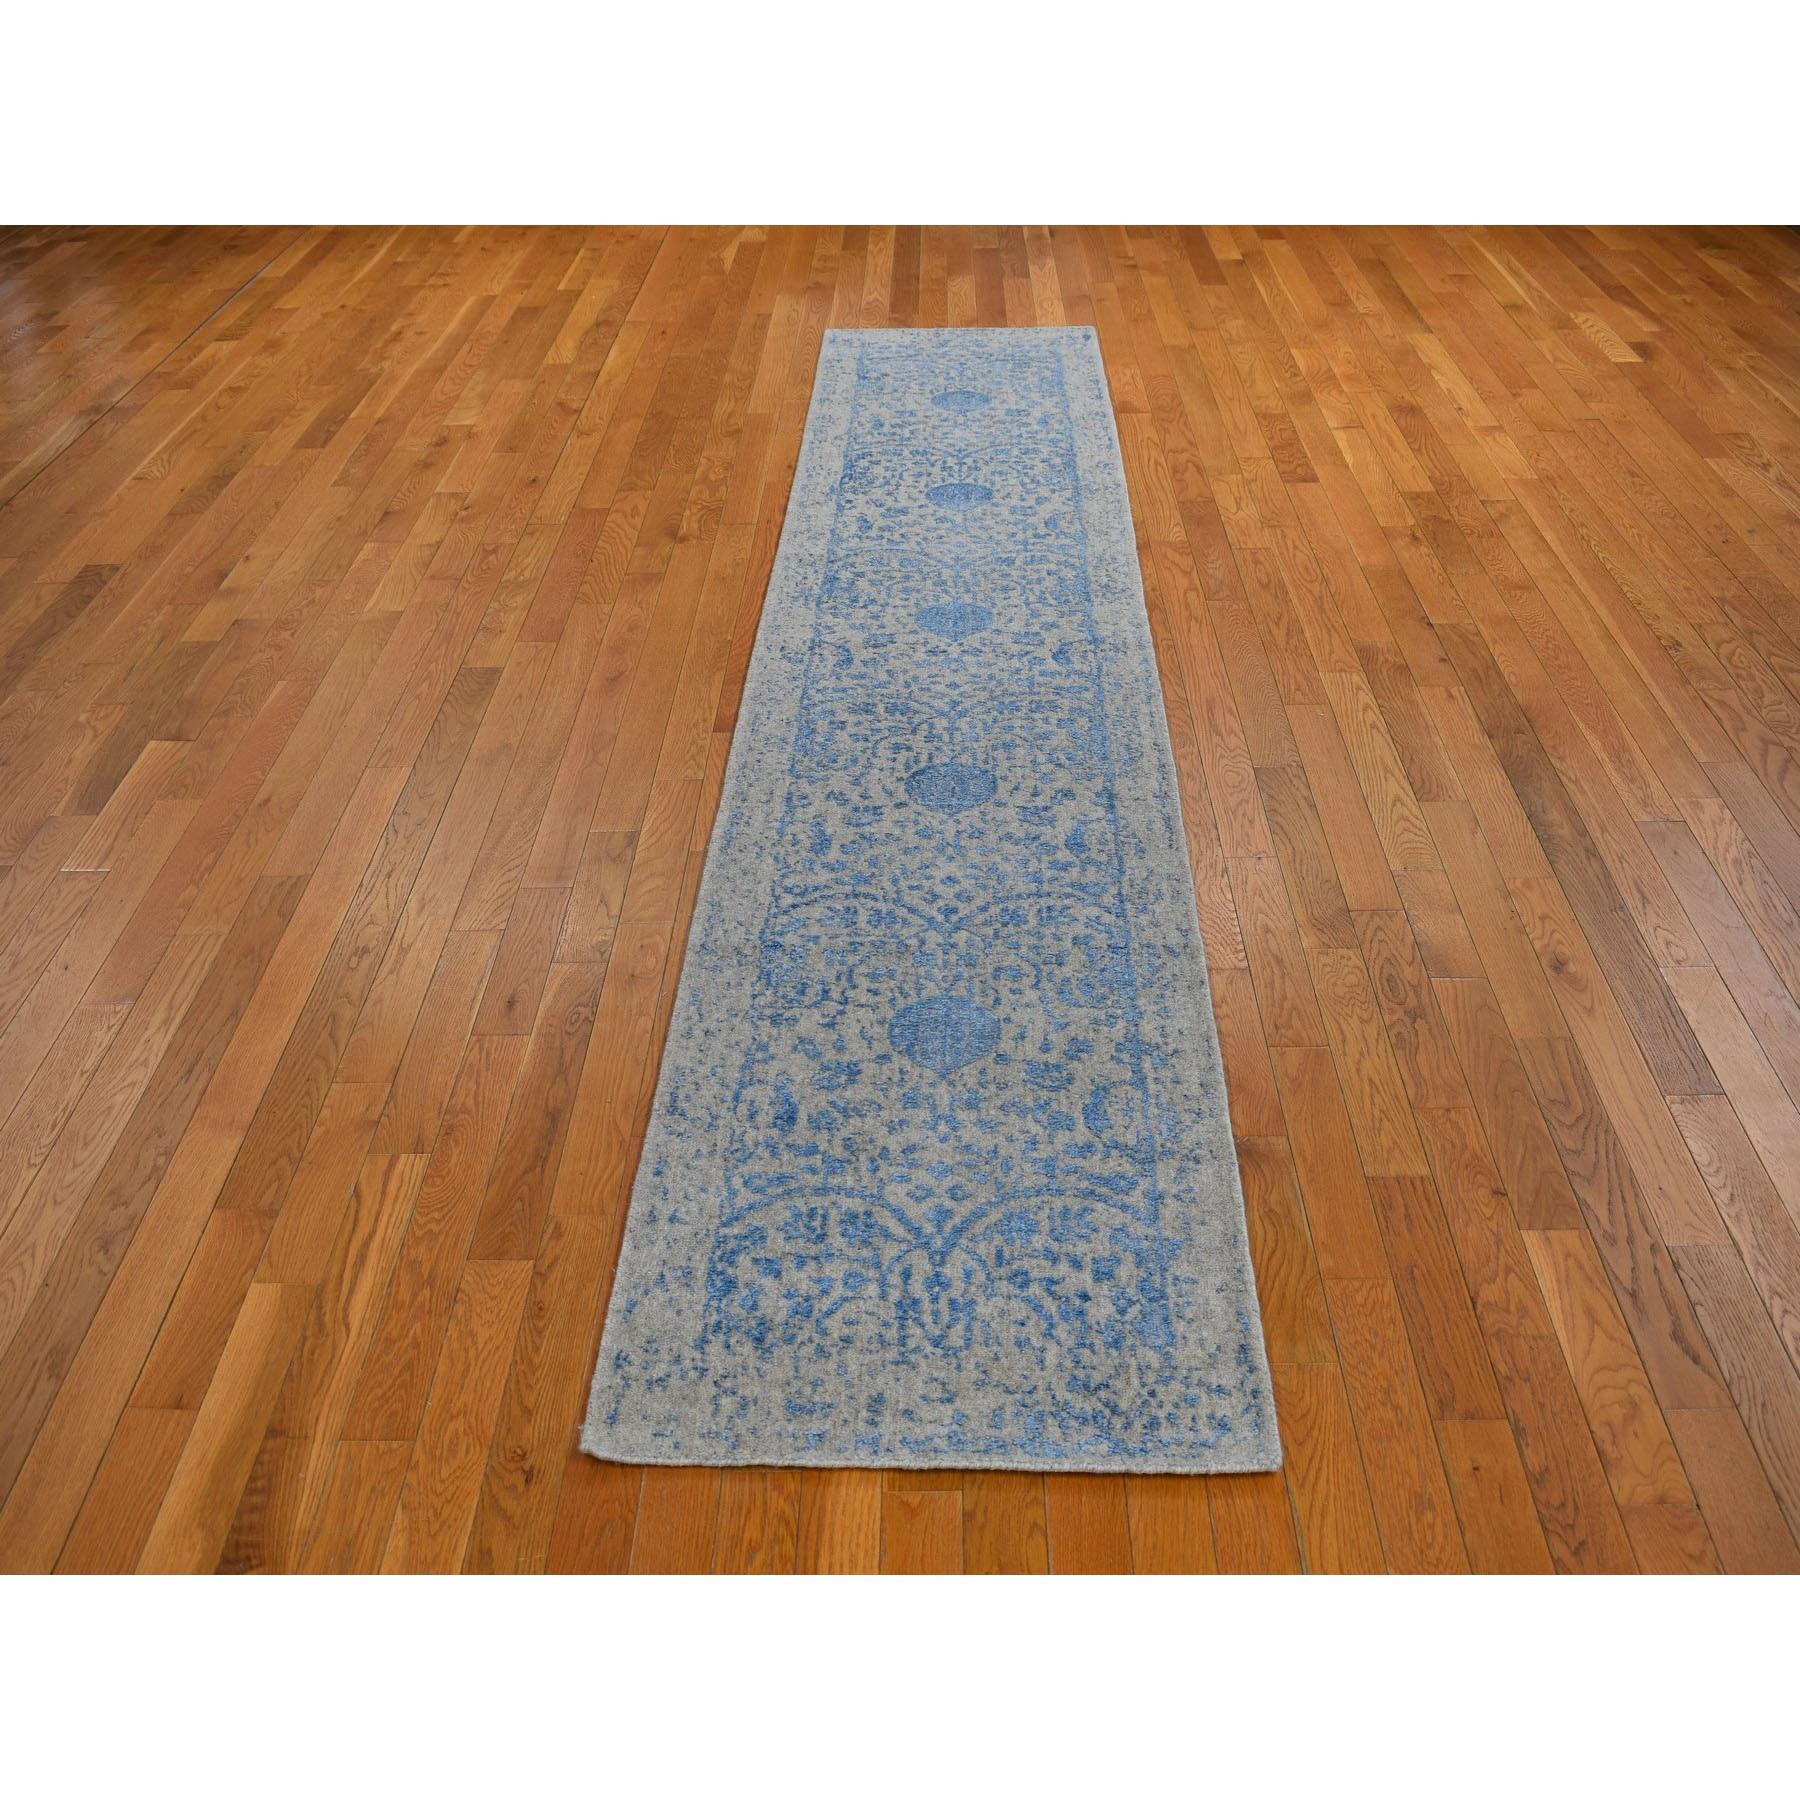 "2'5""x12' Blue Jacquard Hand Loomed Wool and Art Silk Pomegranate Design Runner Oriental Rug"